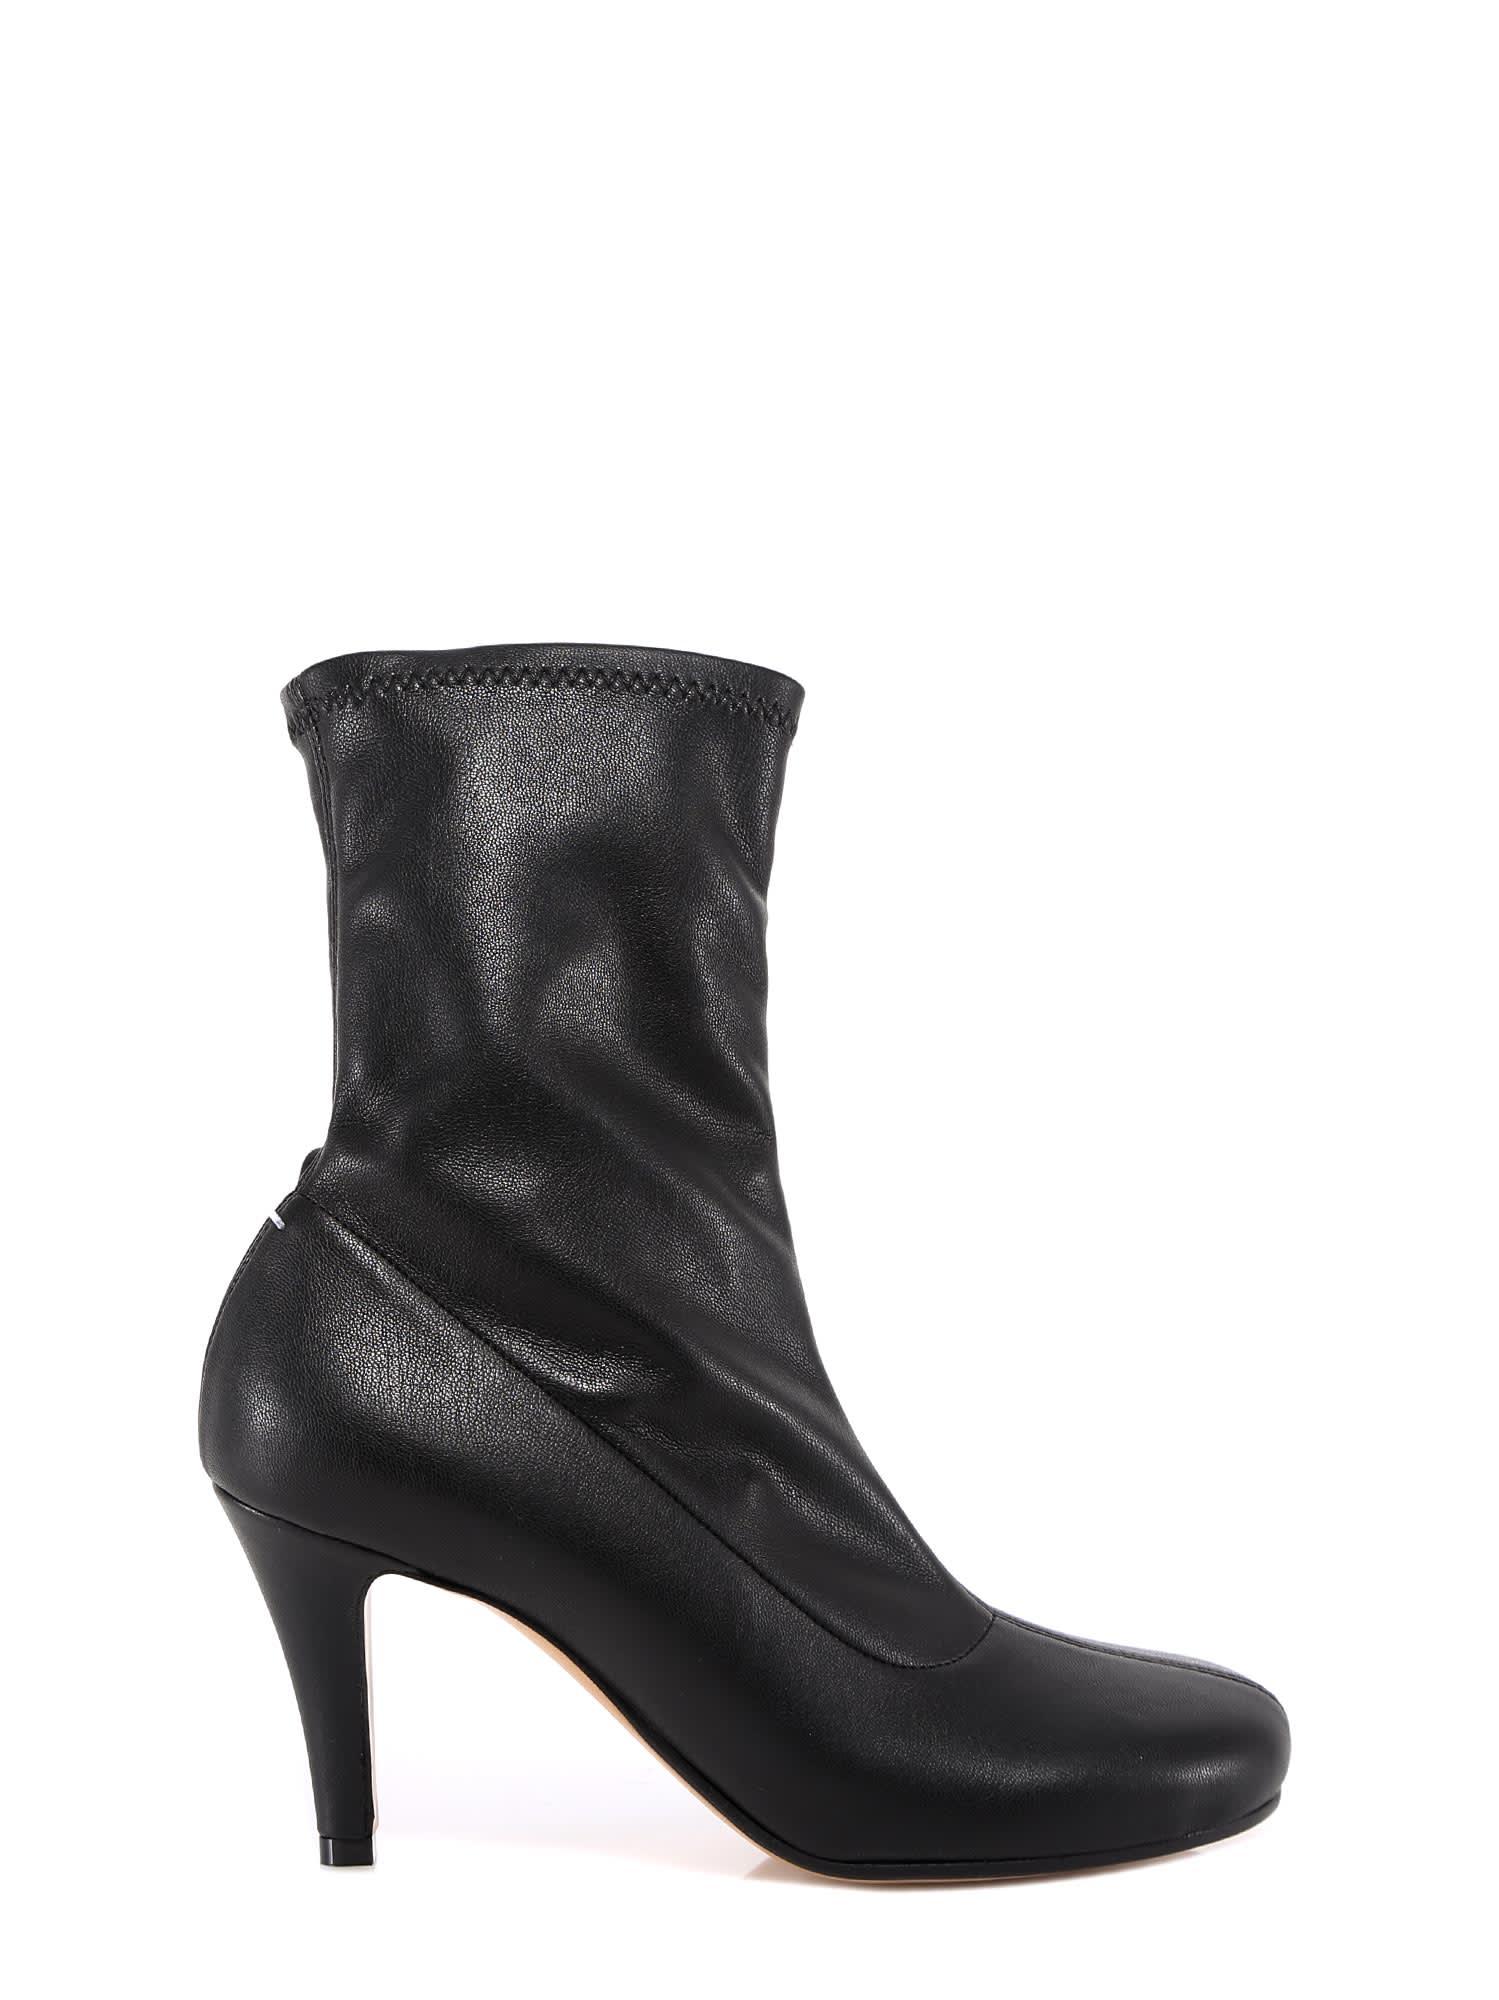 Buy Maison Margiela Leather Sock Boots online, shop Maison Margiela shoes with free shipping